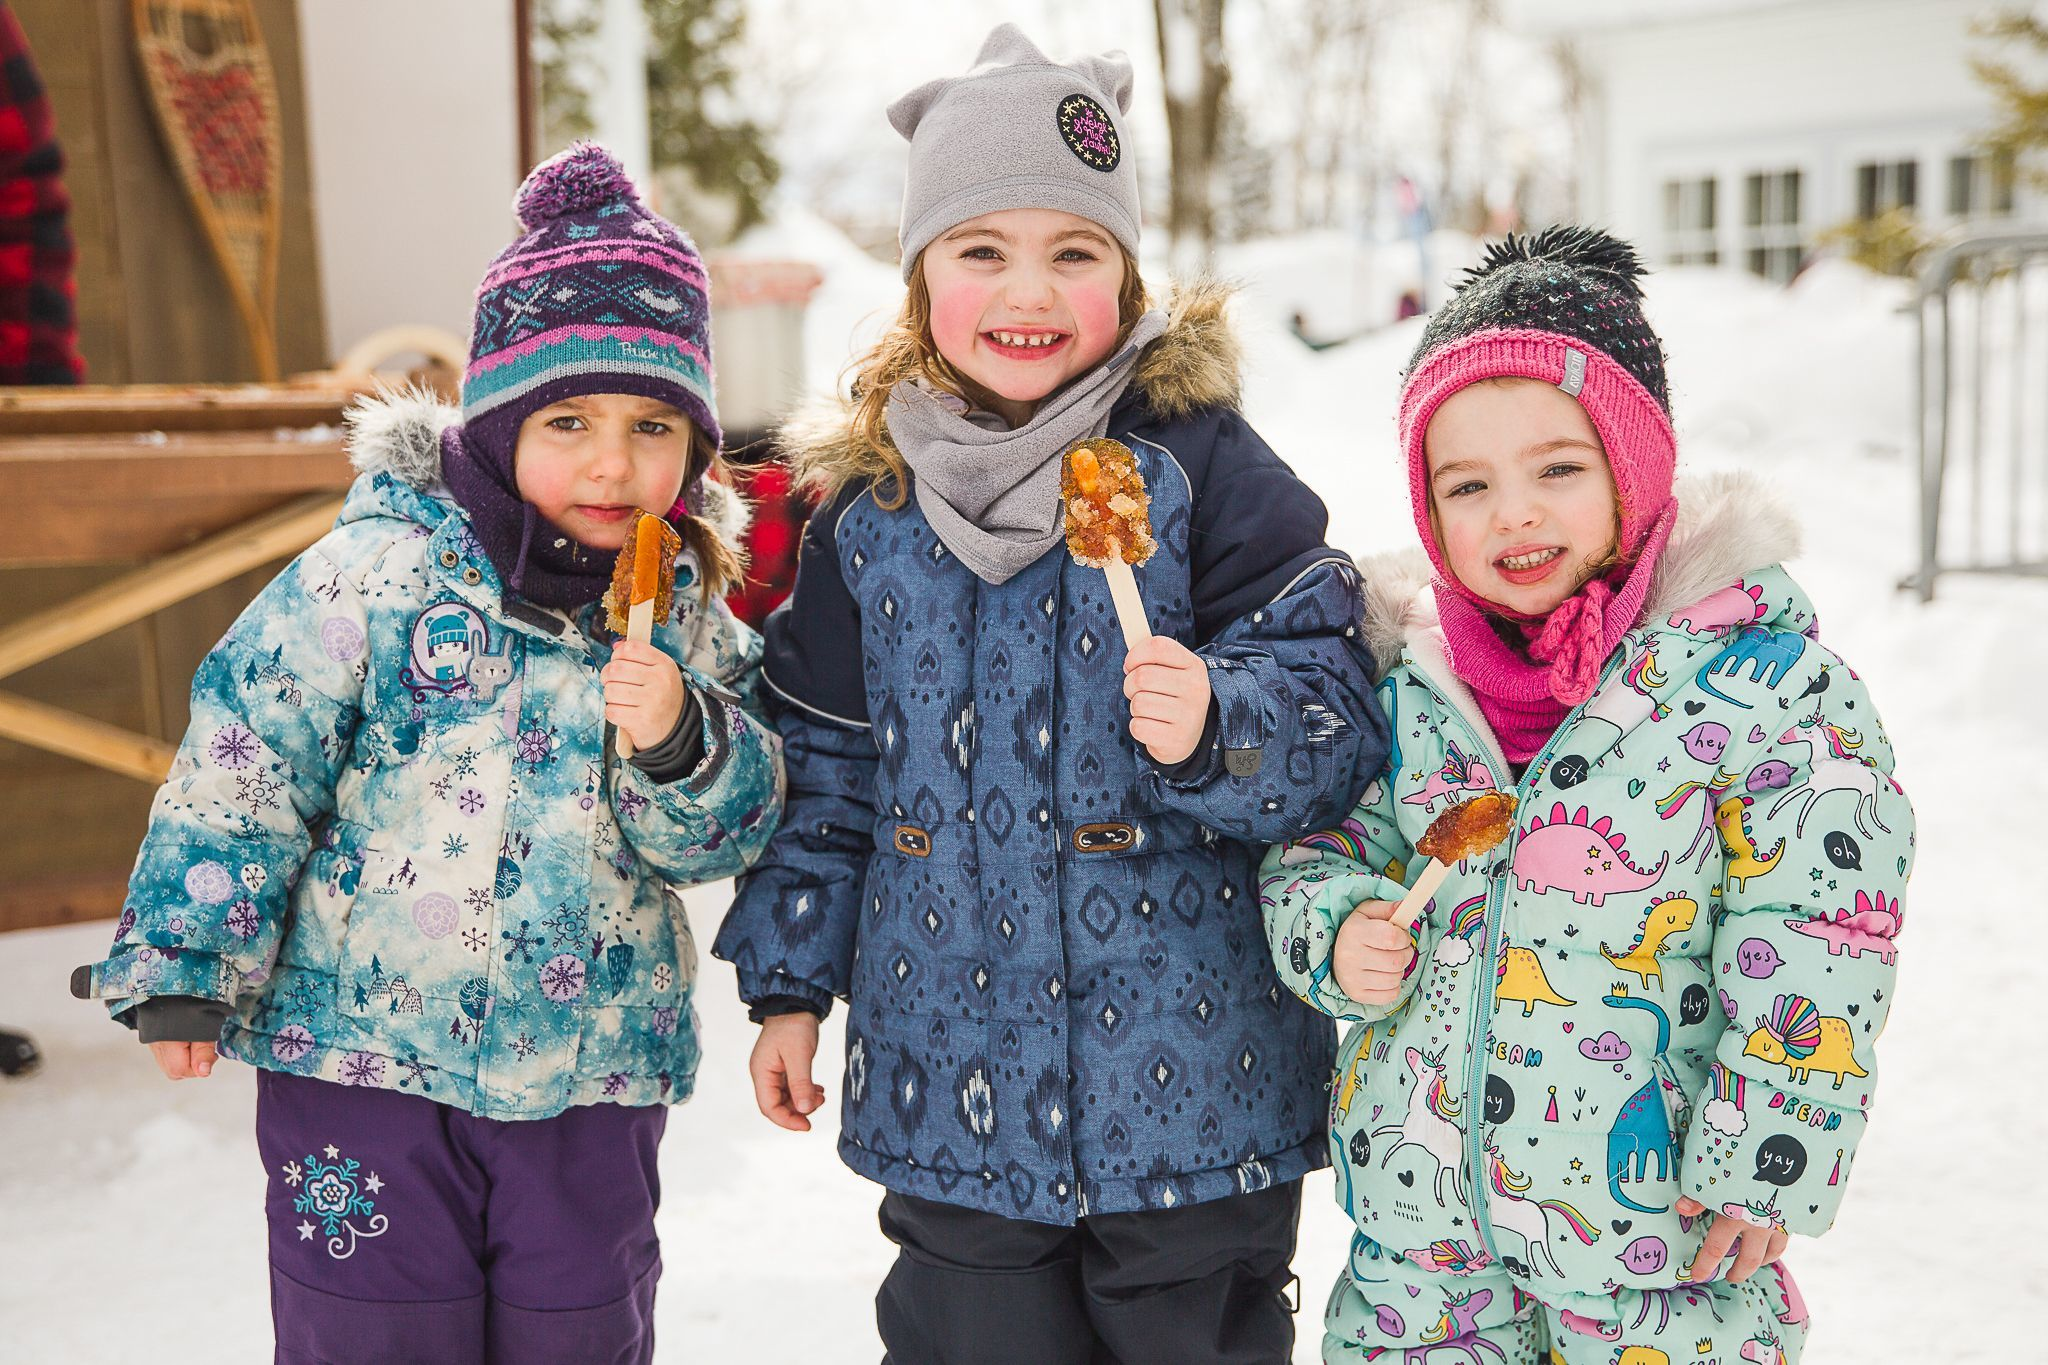 Kids enjoying maple taffy at the Quebec Winter Carnival